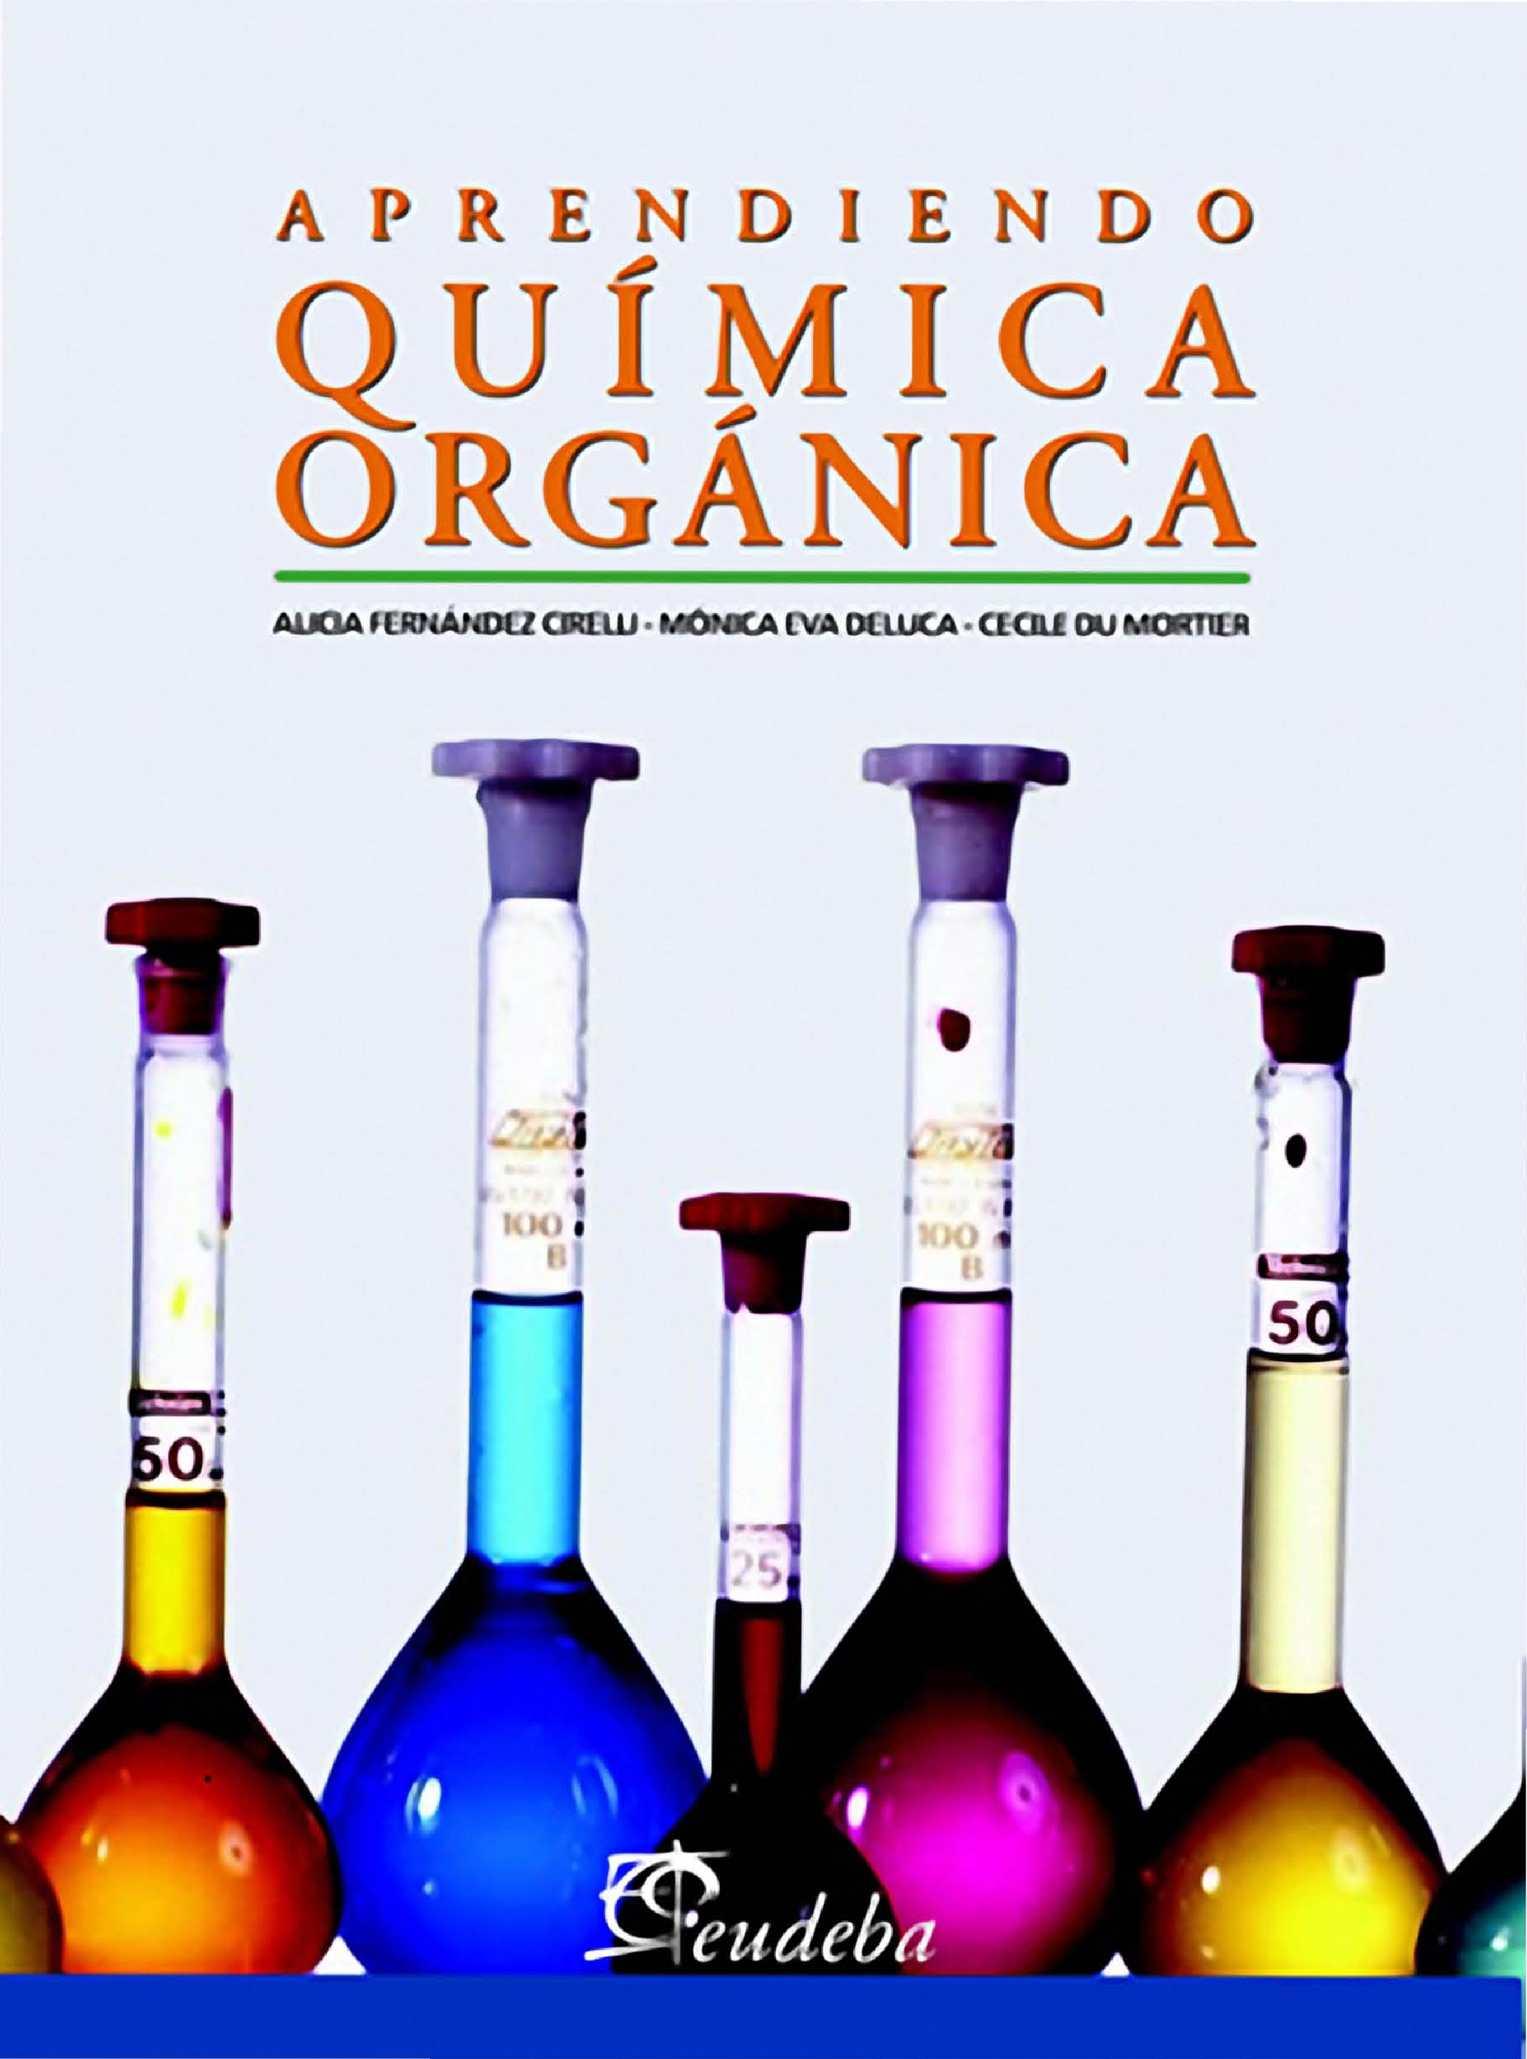 Calaméo Aprendiendo Quimica Organica